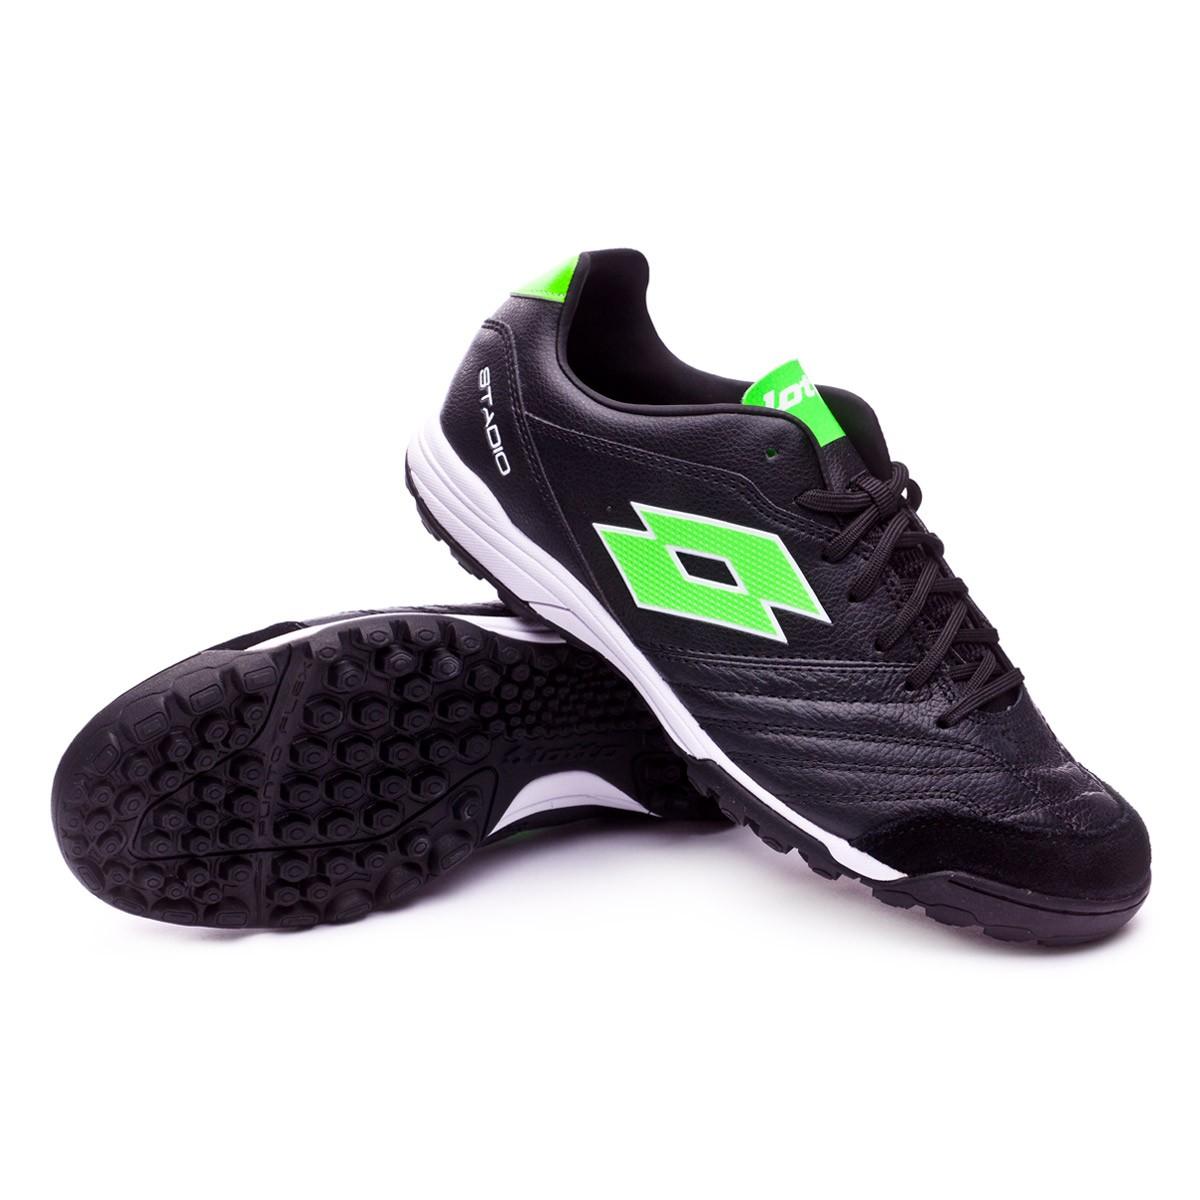 89e5dbf2f8496 Football Boot Lotto Stadio 300 II Turf Black-Mint - Tienda de fútbol ...